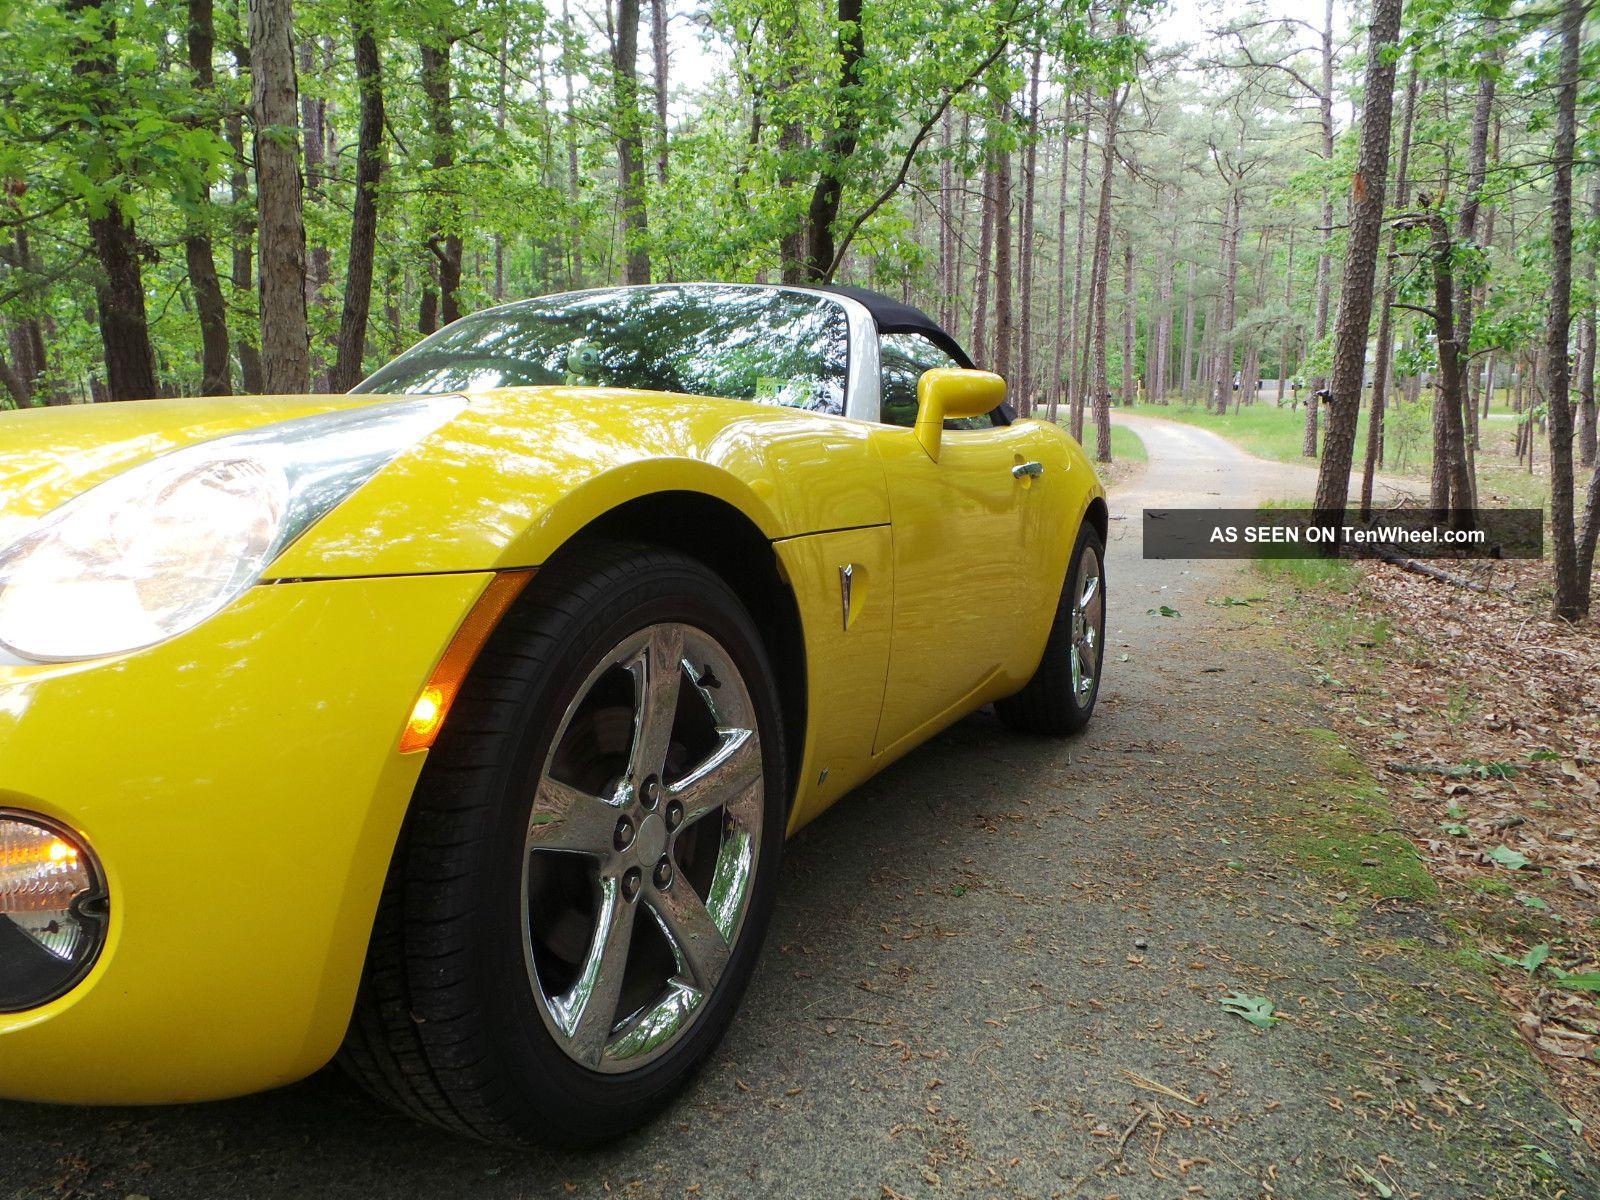 Yellow 2007 Pontiac Solstice Convertible Solstice photo